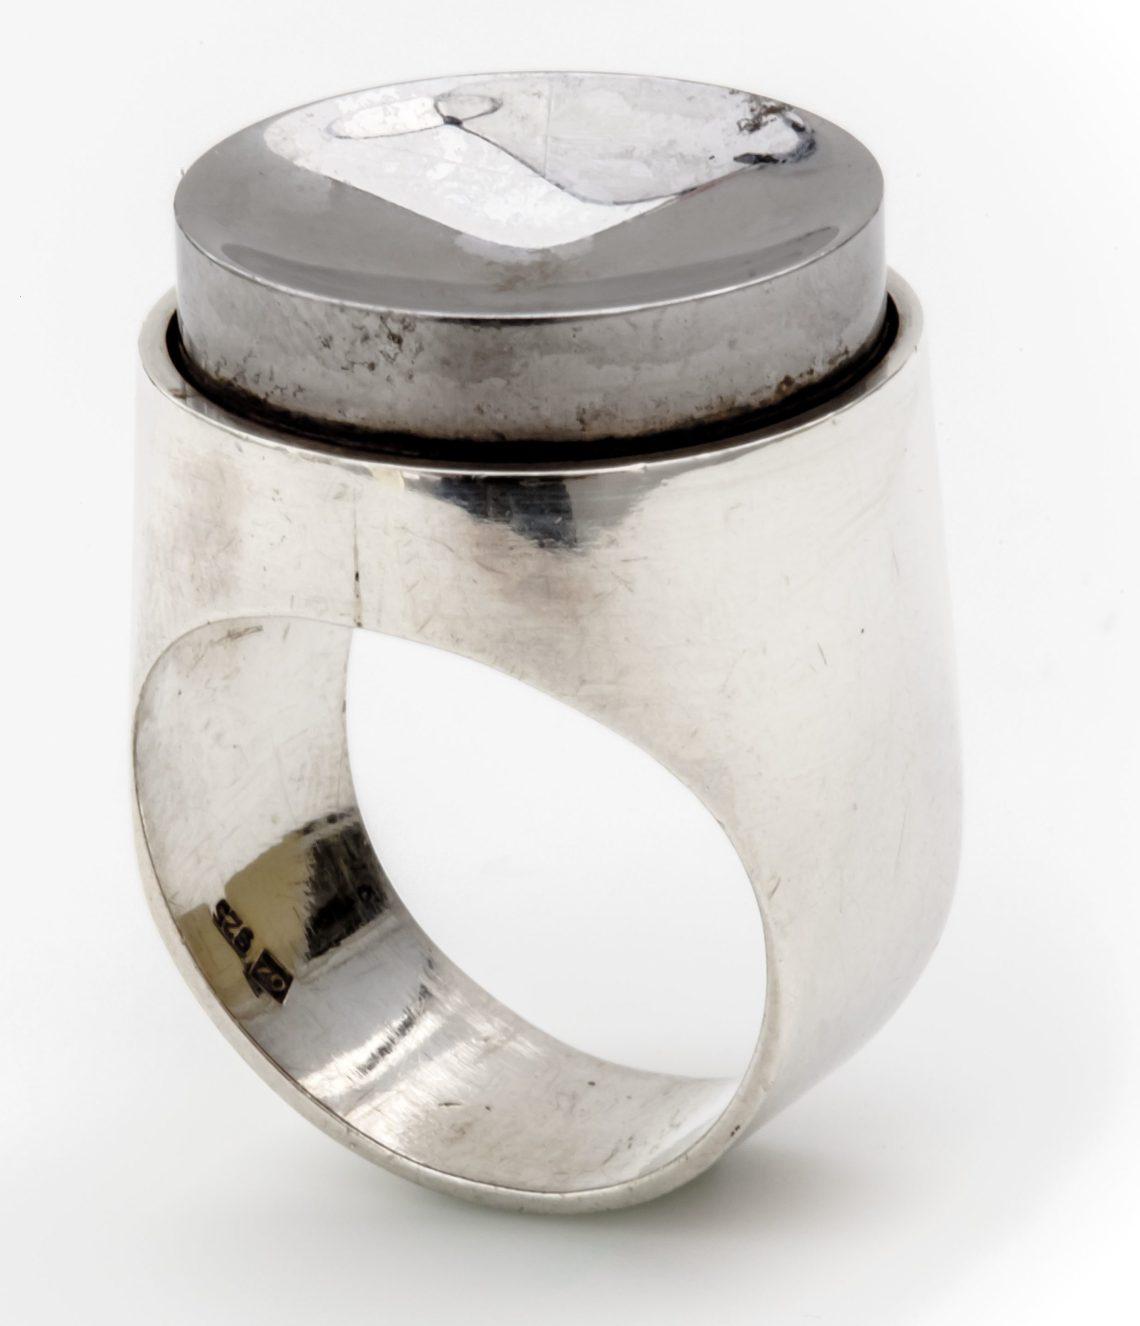 Othmar Zschaler, ring, 1957. Collectie Ida Boelen-van Gelder. Fotografie Aldo Smit©